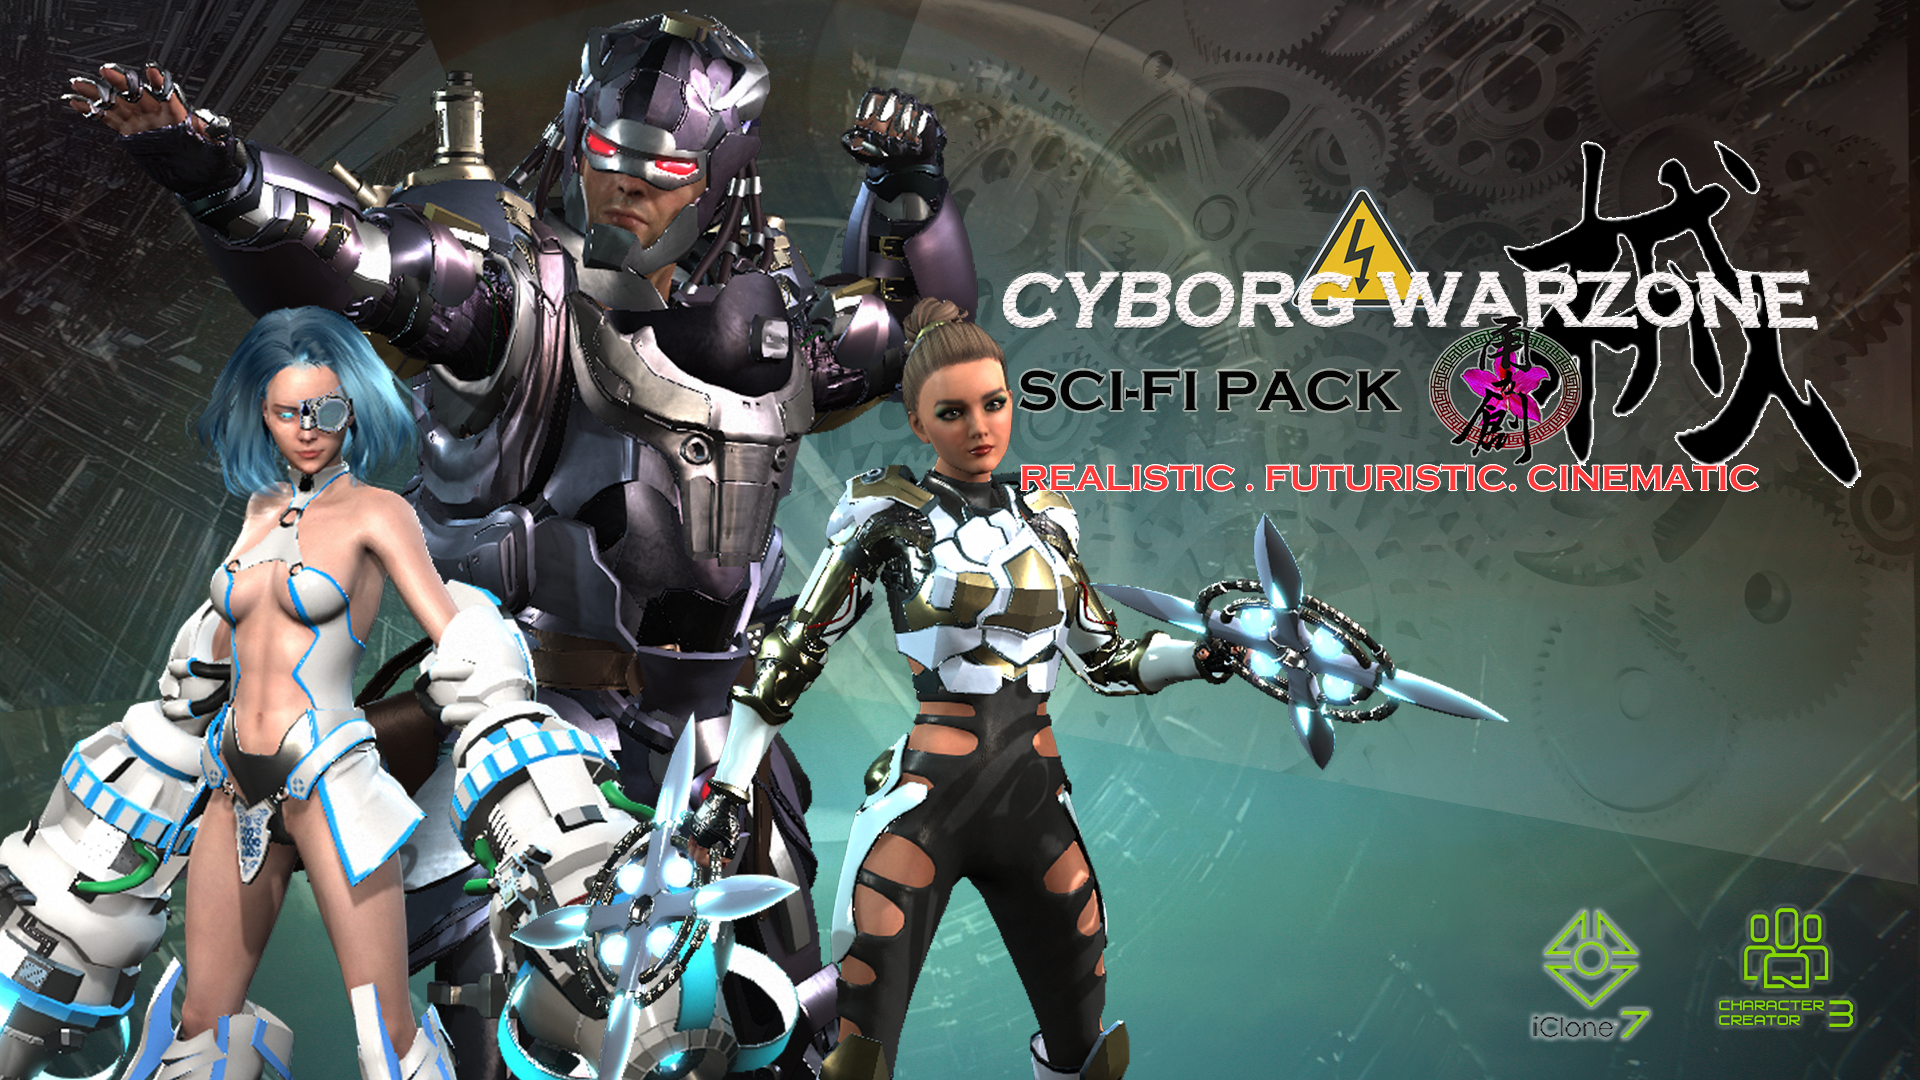 CyborgWarZone-SuperPack-Poster01V2